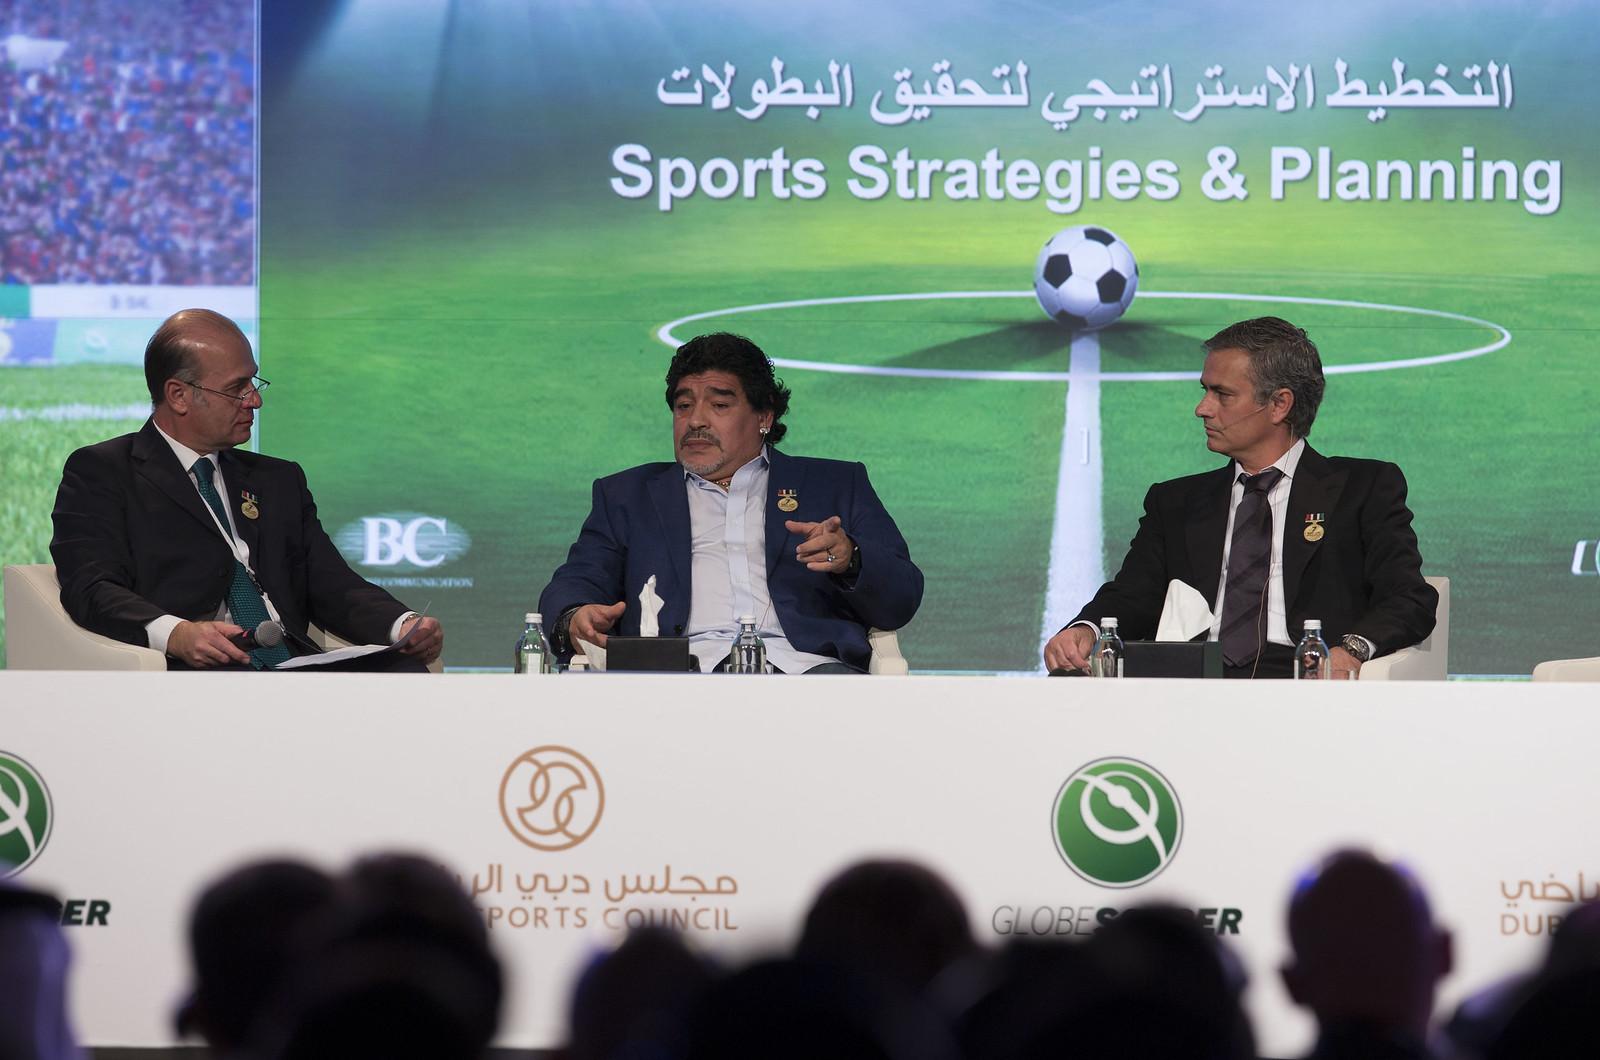 Umberto Gandini, Diego Armando Maradona and Josè Mourinho